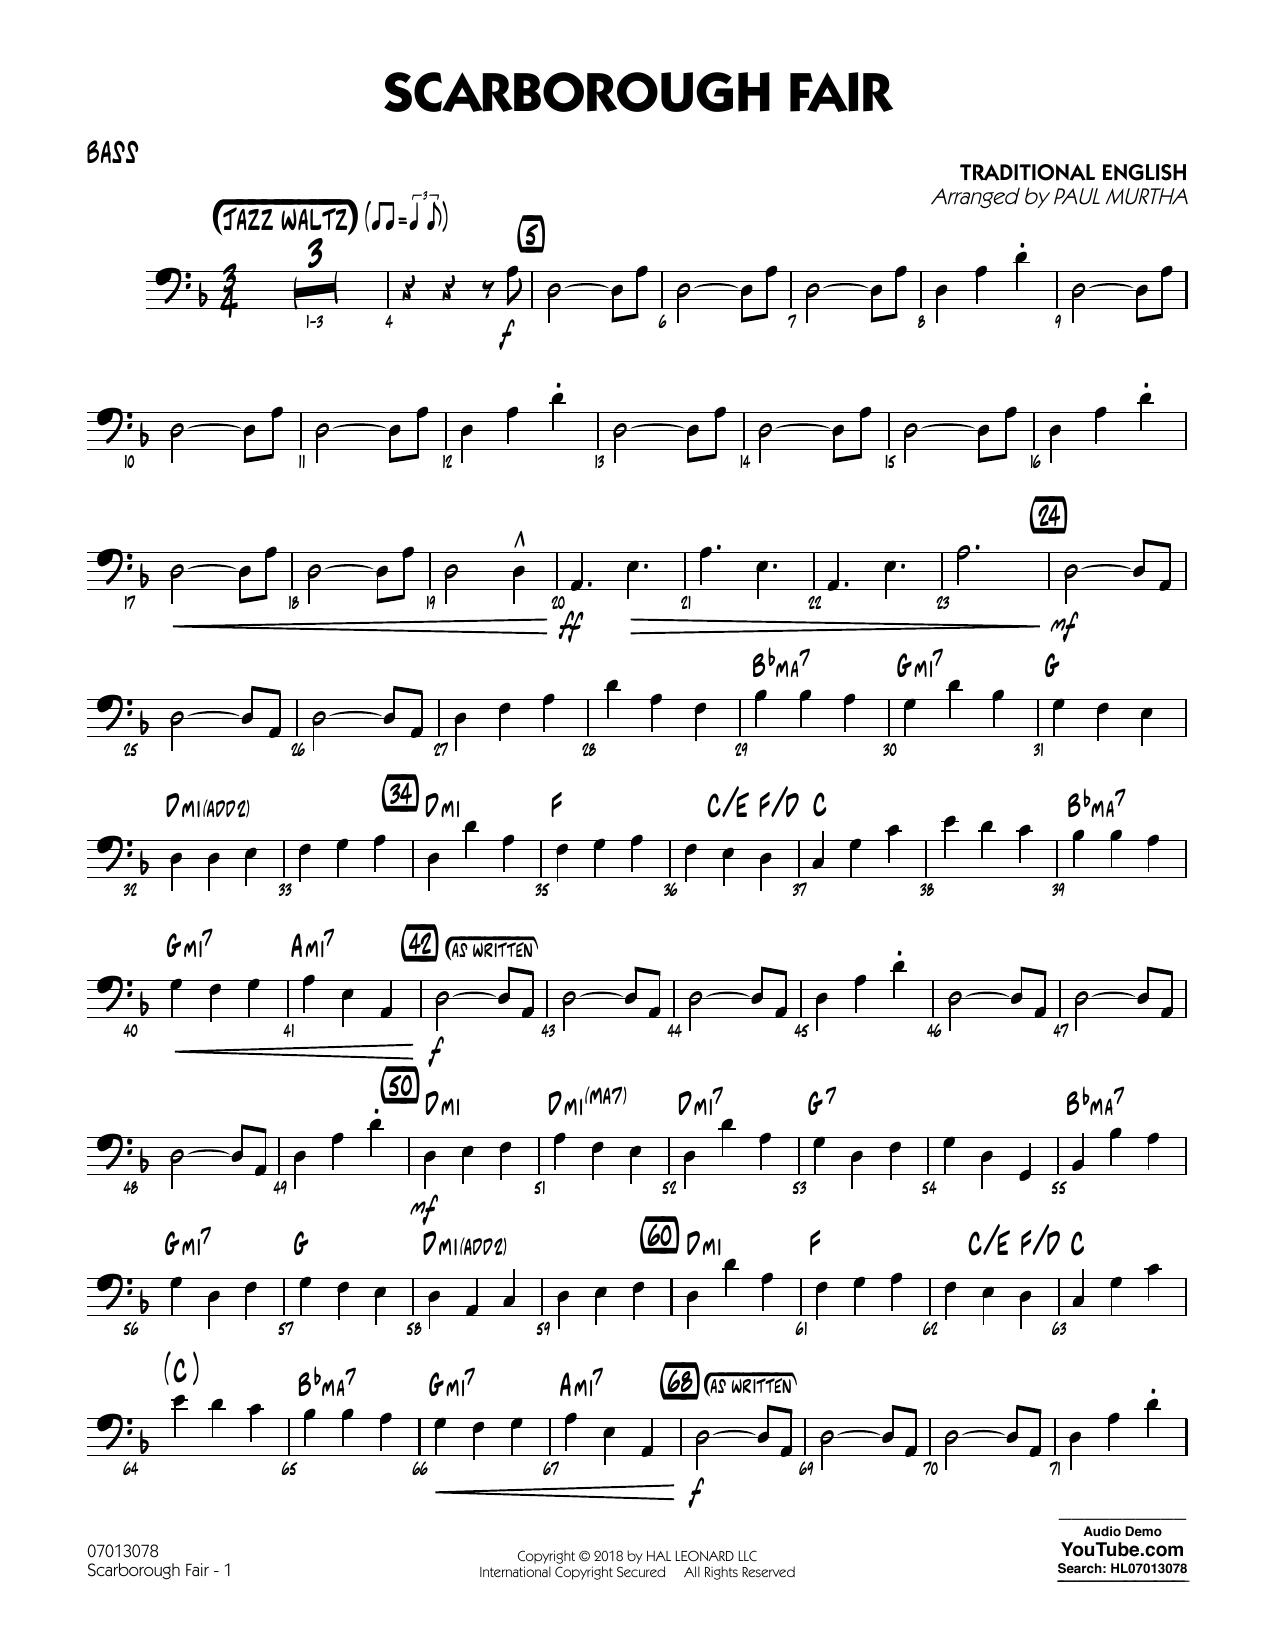 Paul Murtha Scarborough Fair - Bass sheet music notes and chords. Download Printable PDF.